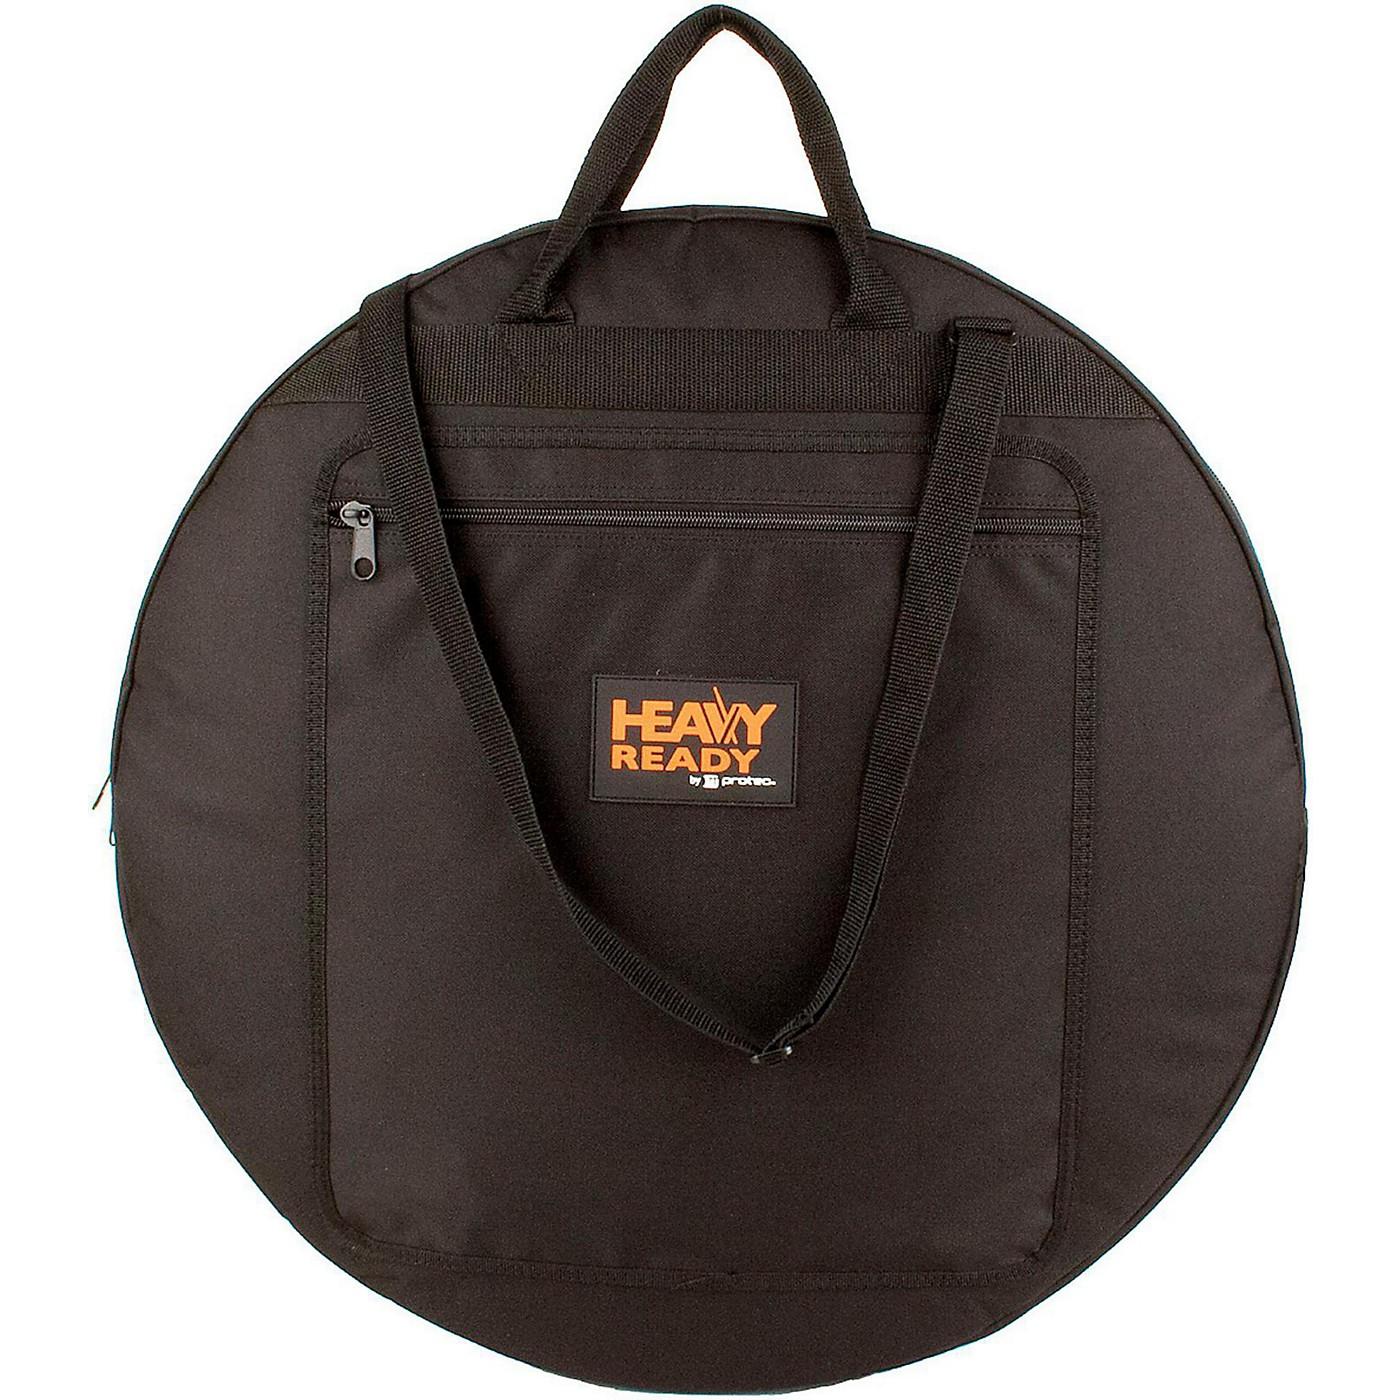 Protec Heavy Ready Series - Cymbal Bag thumbnail